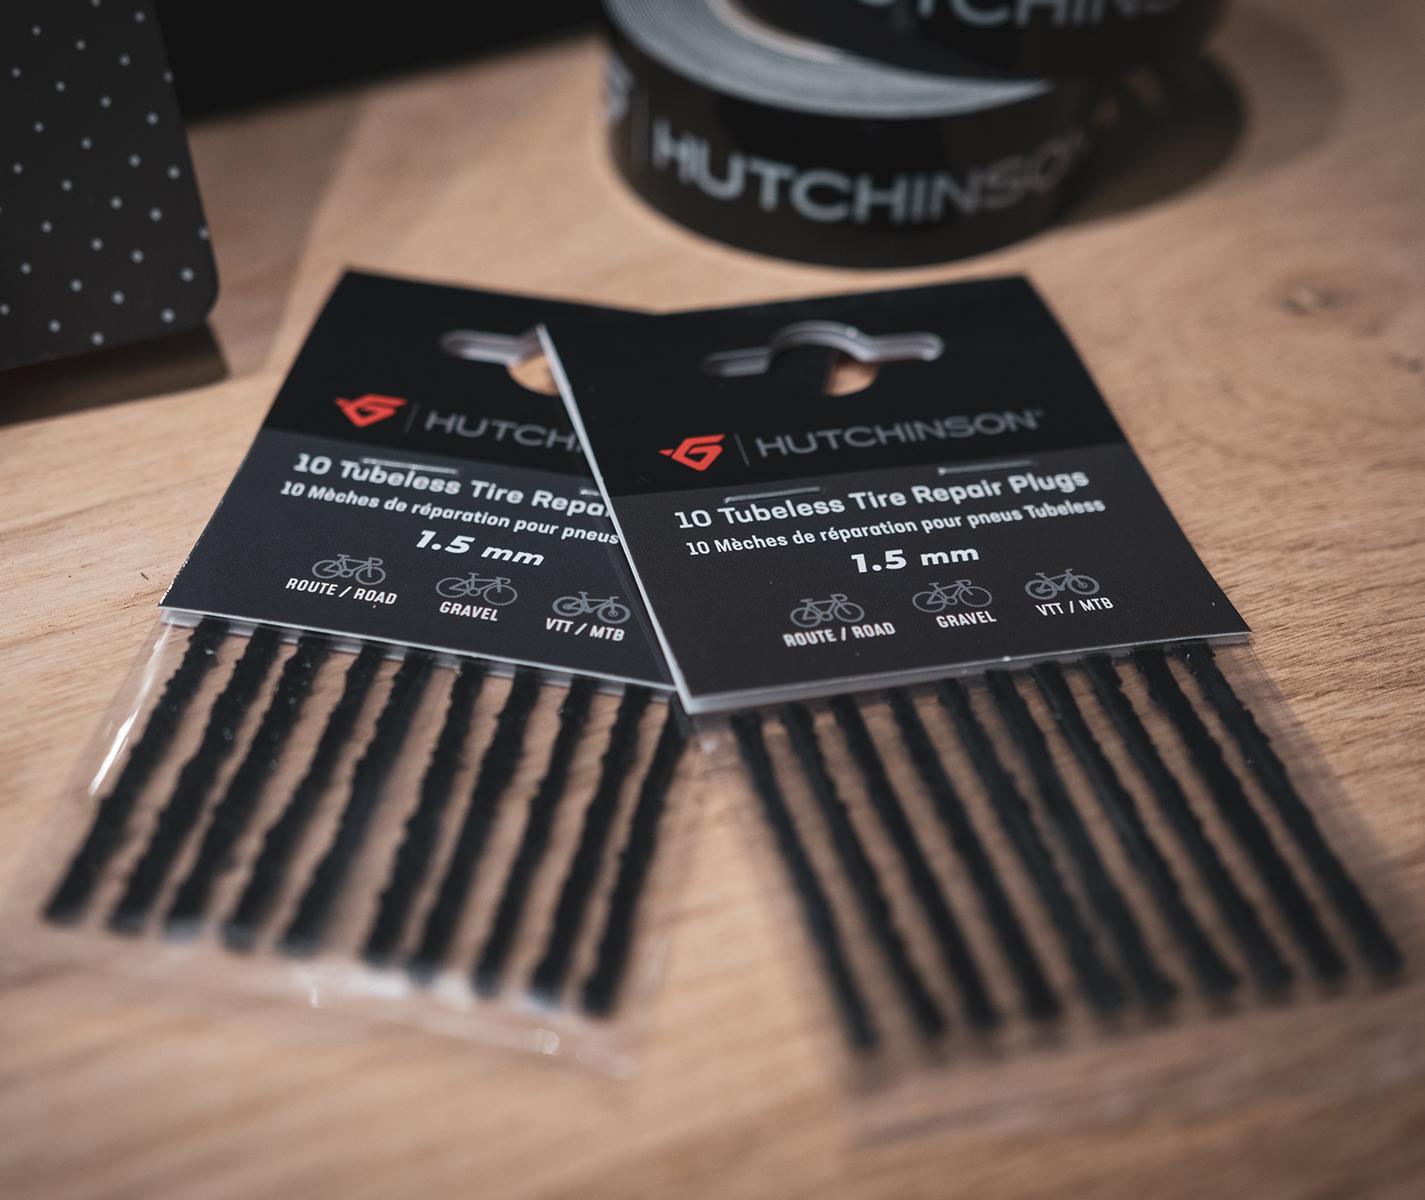 hutchinson-accessories-plugs-kit-2